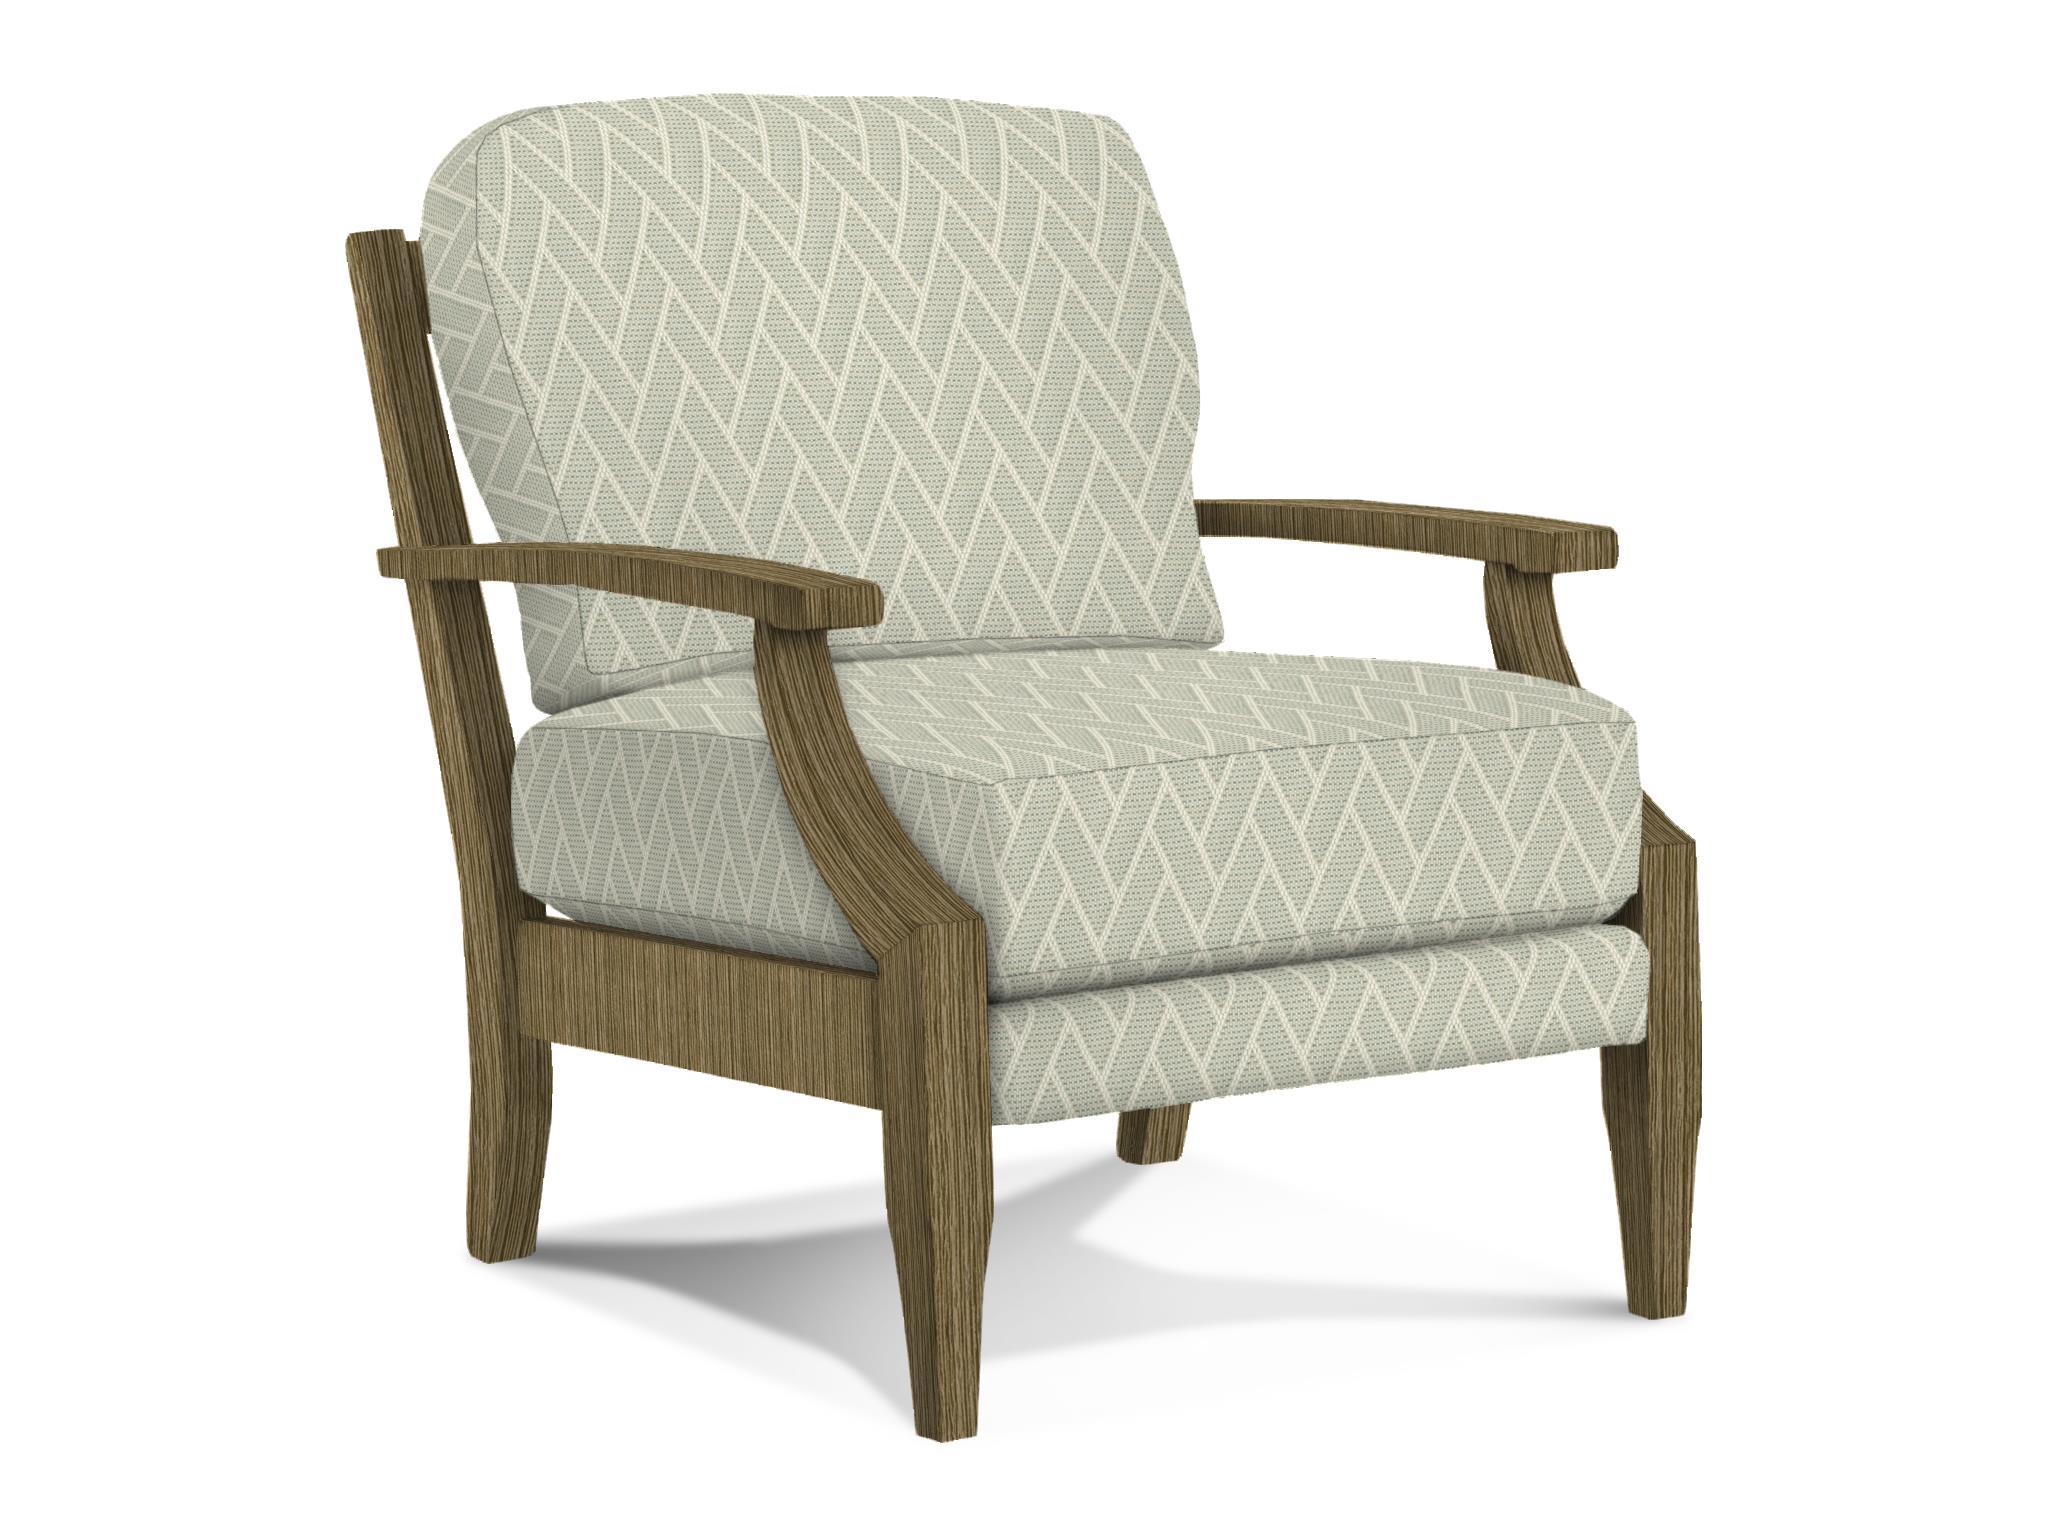 Best Home Furnishings 3000r 35257